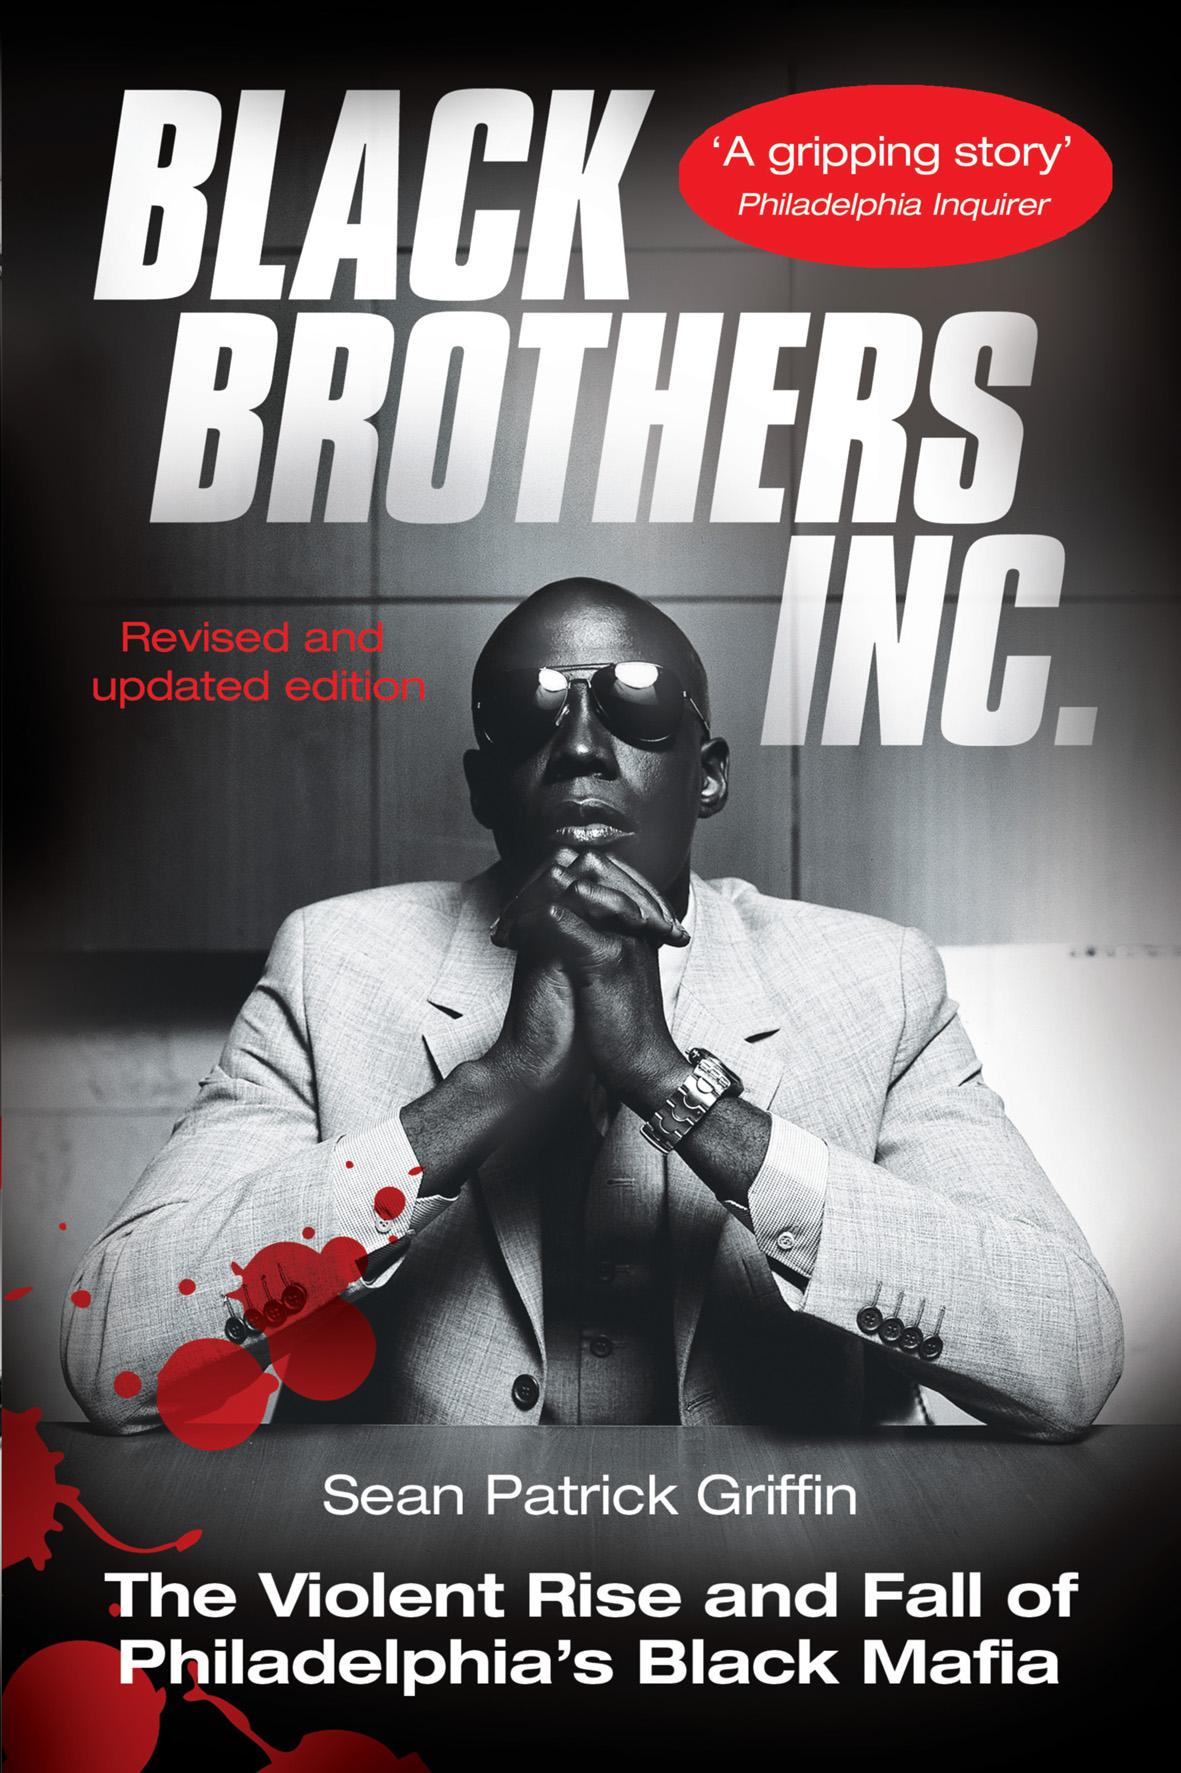 Black Brothers Inc.